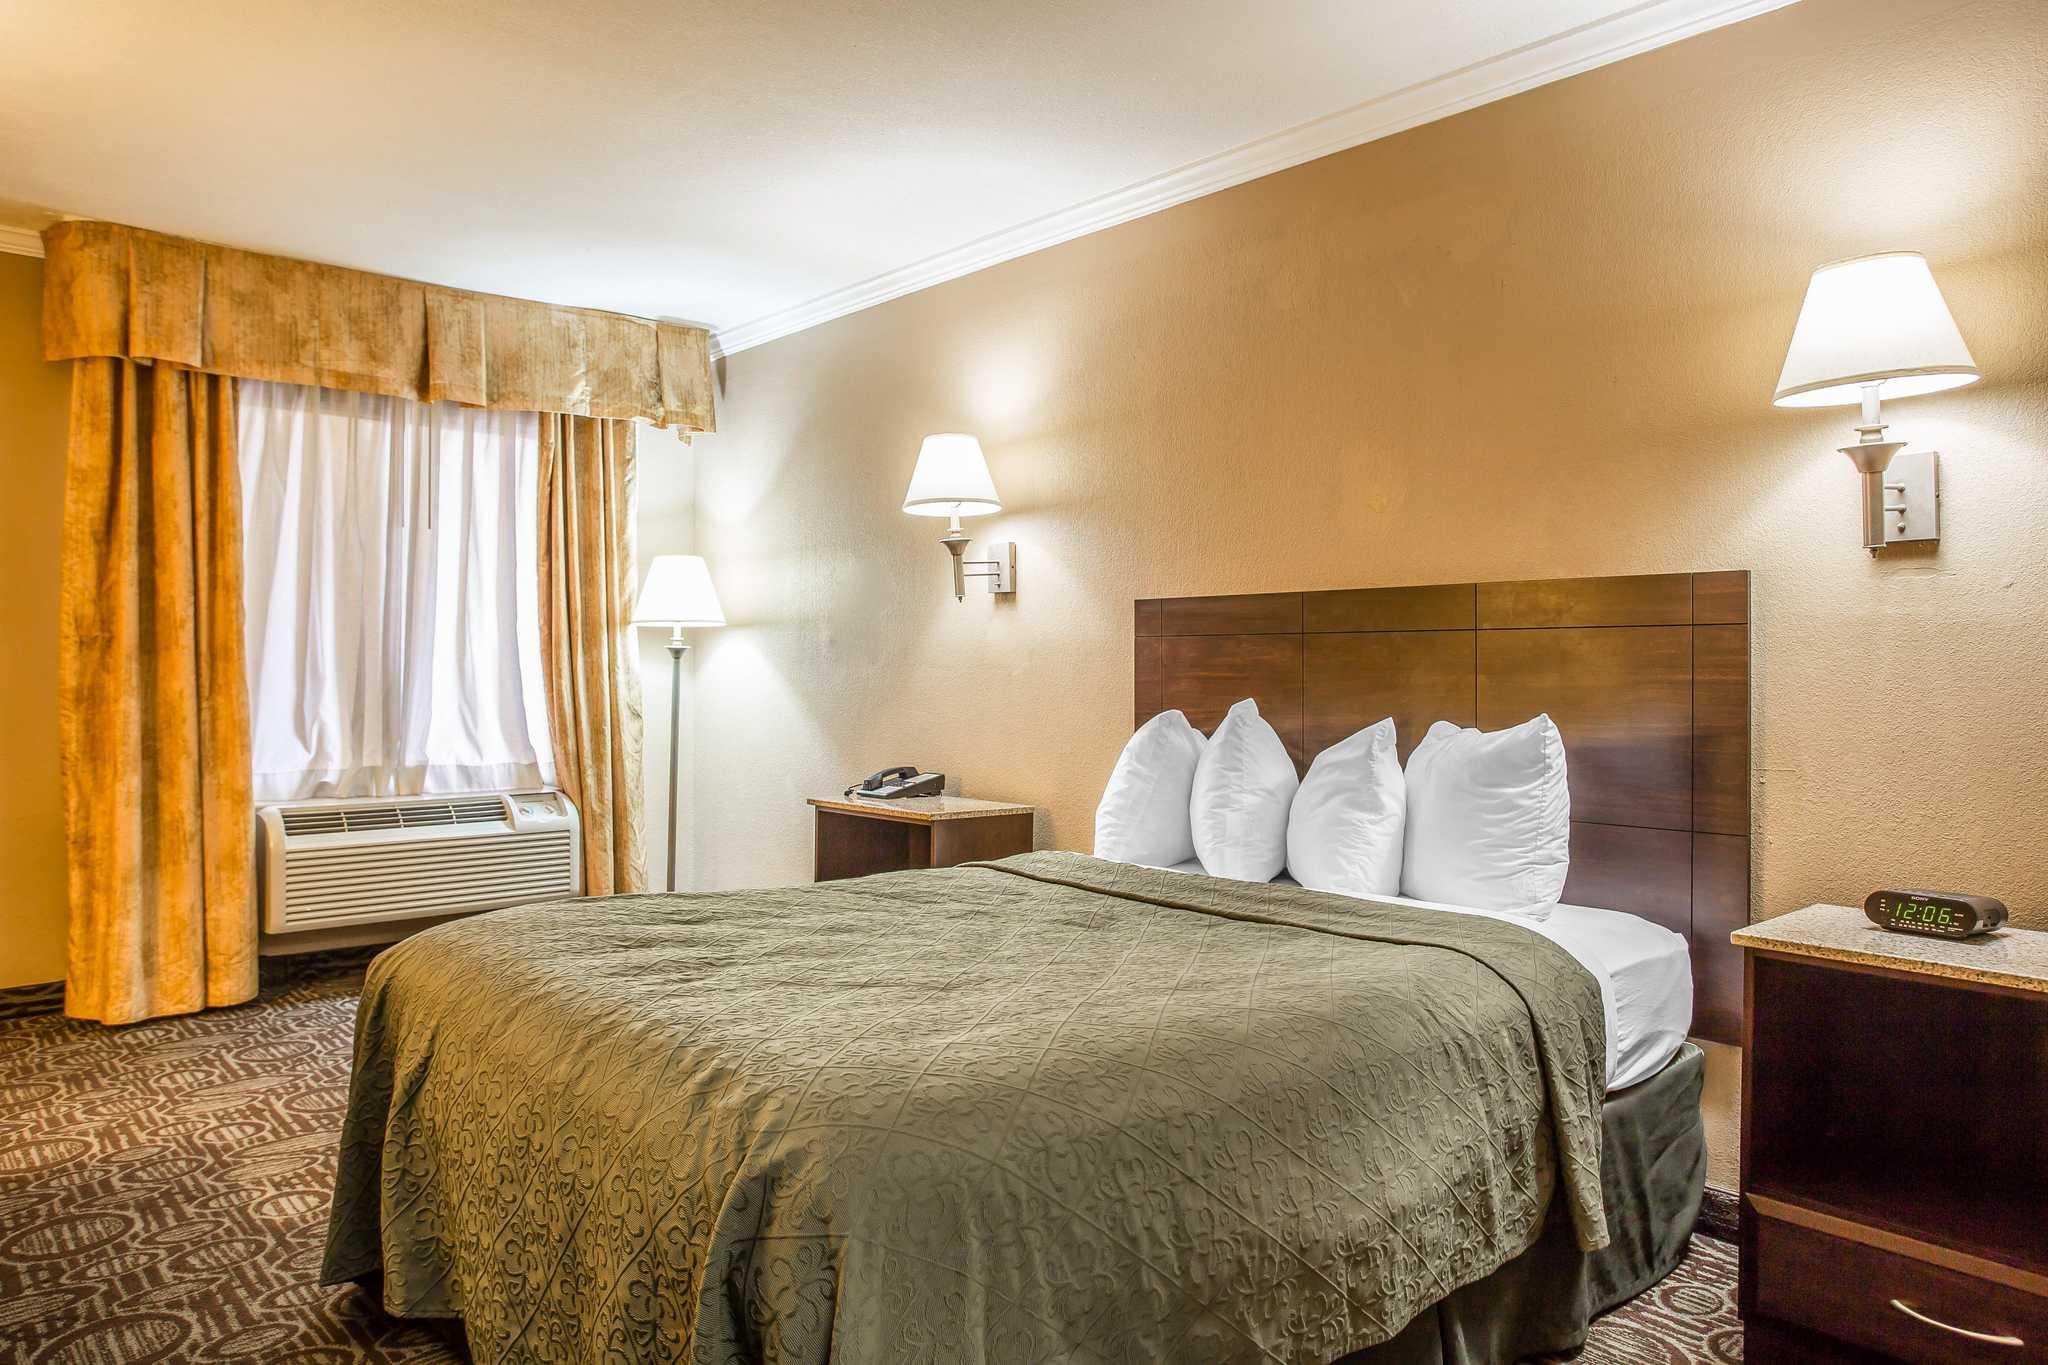 Quality Inn & Suites Ft. Jackson Maingate image 16